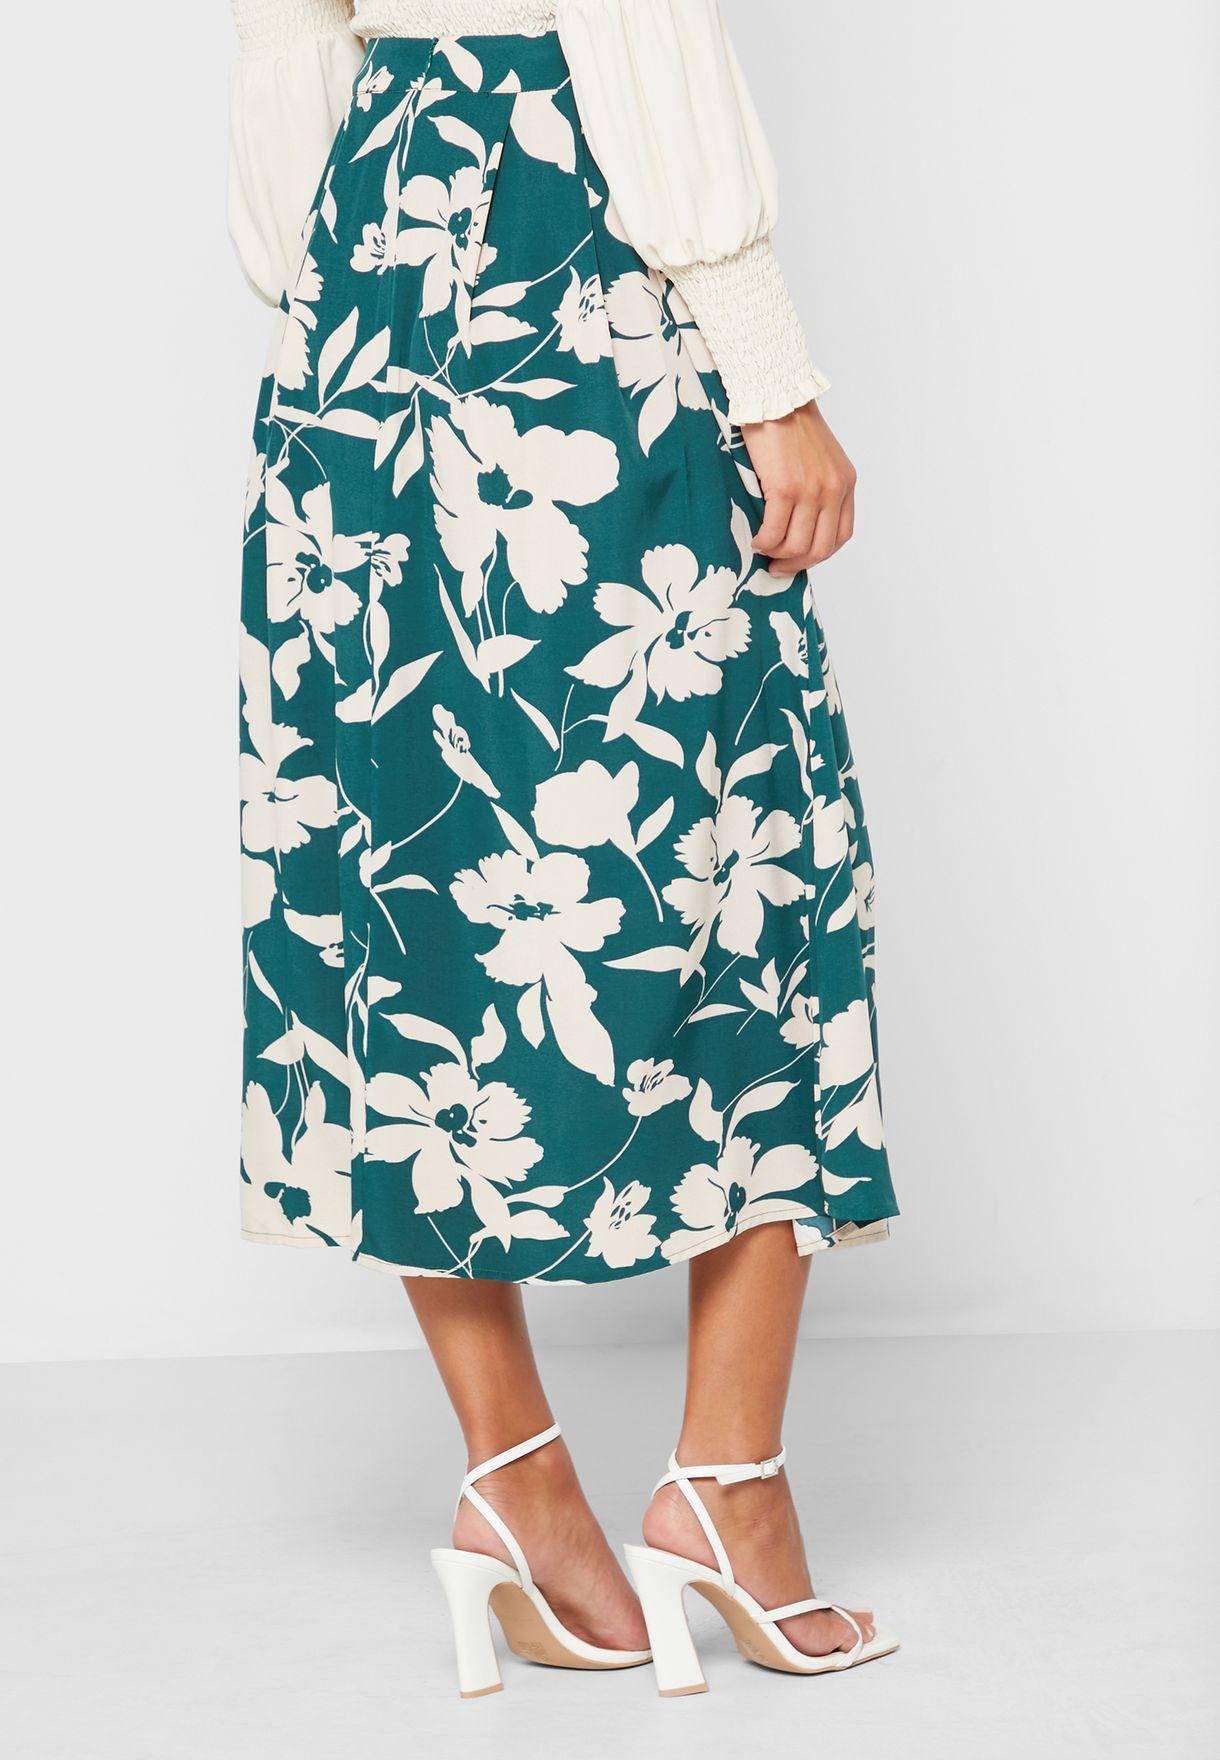 Floral Print Slit Skirt